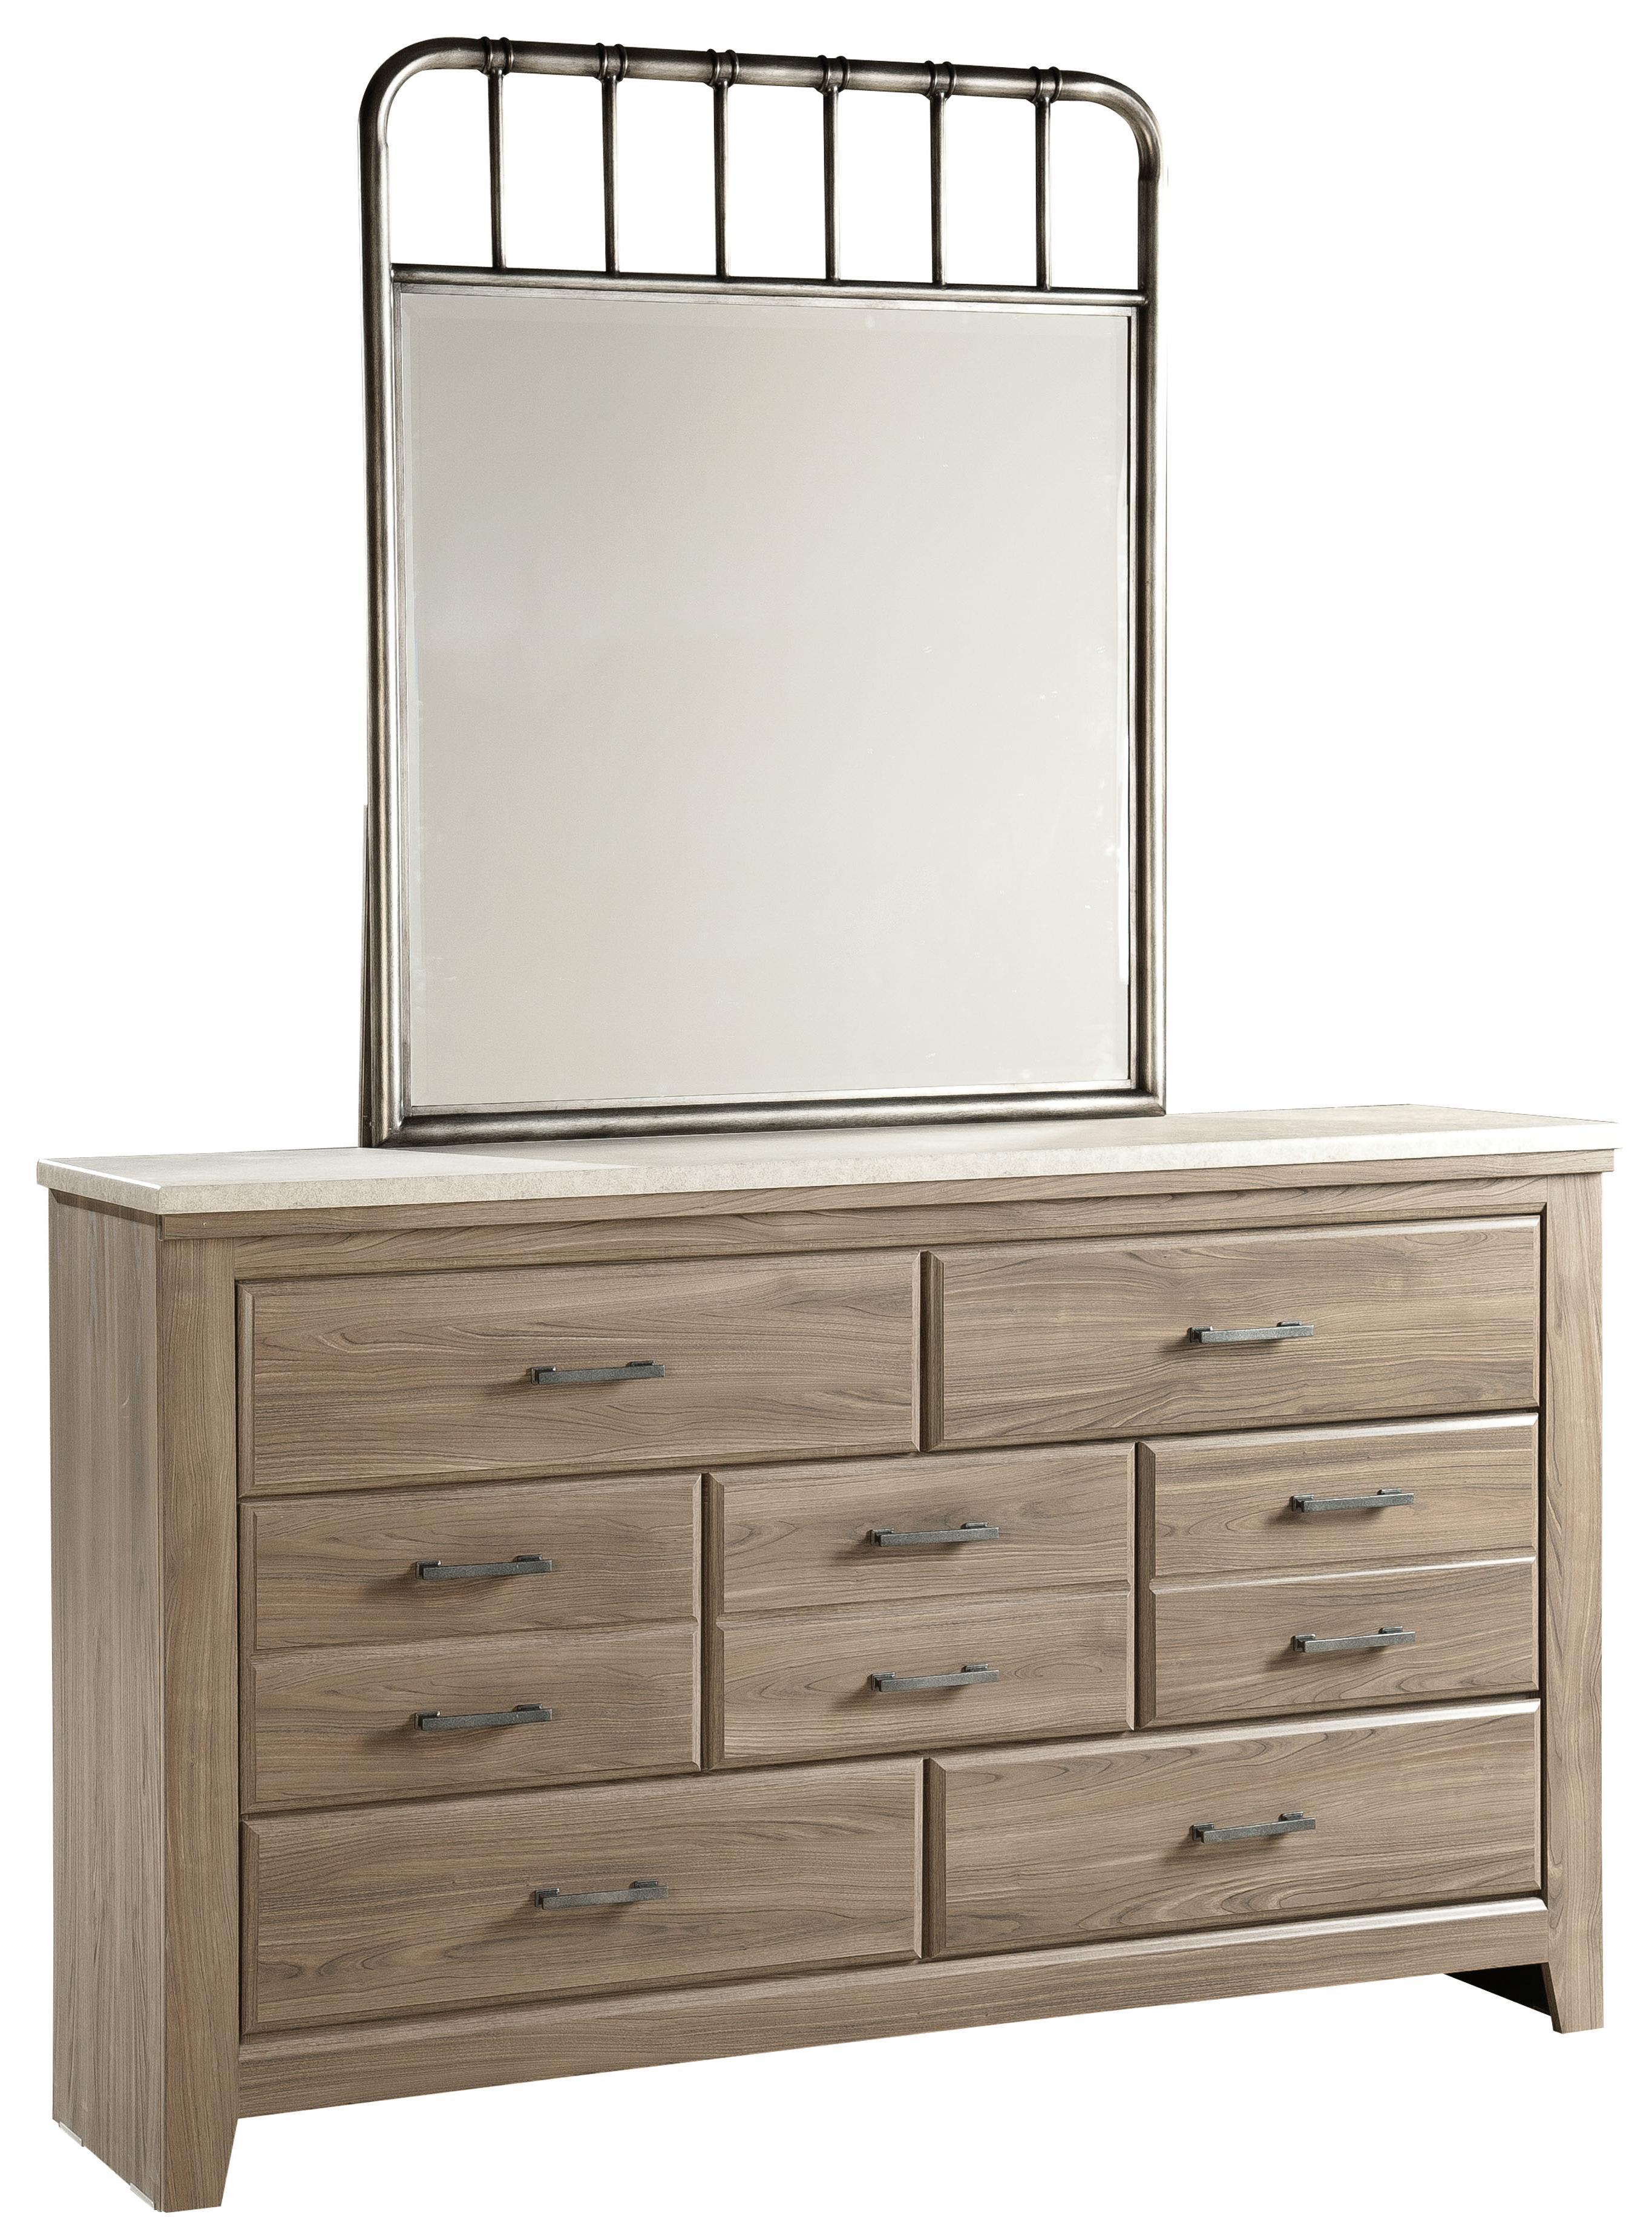 Standard Furniture Stonehill Dresser and Mirror - Item Number: 69409+87508